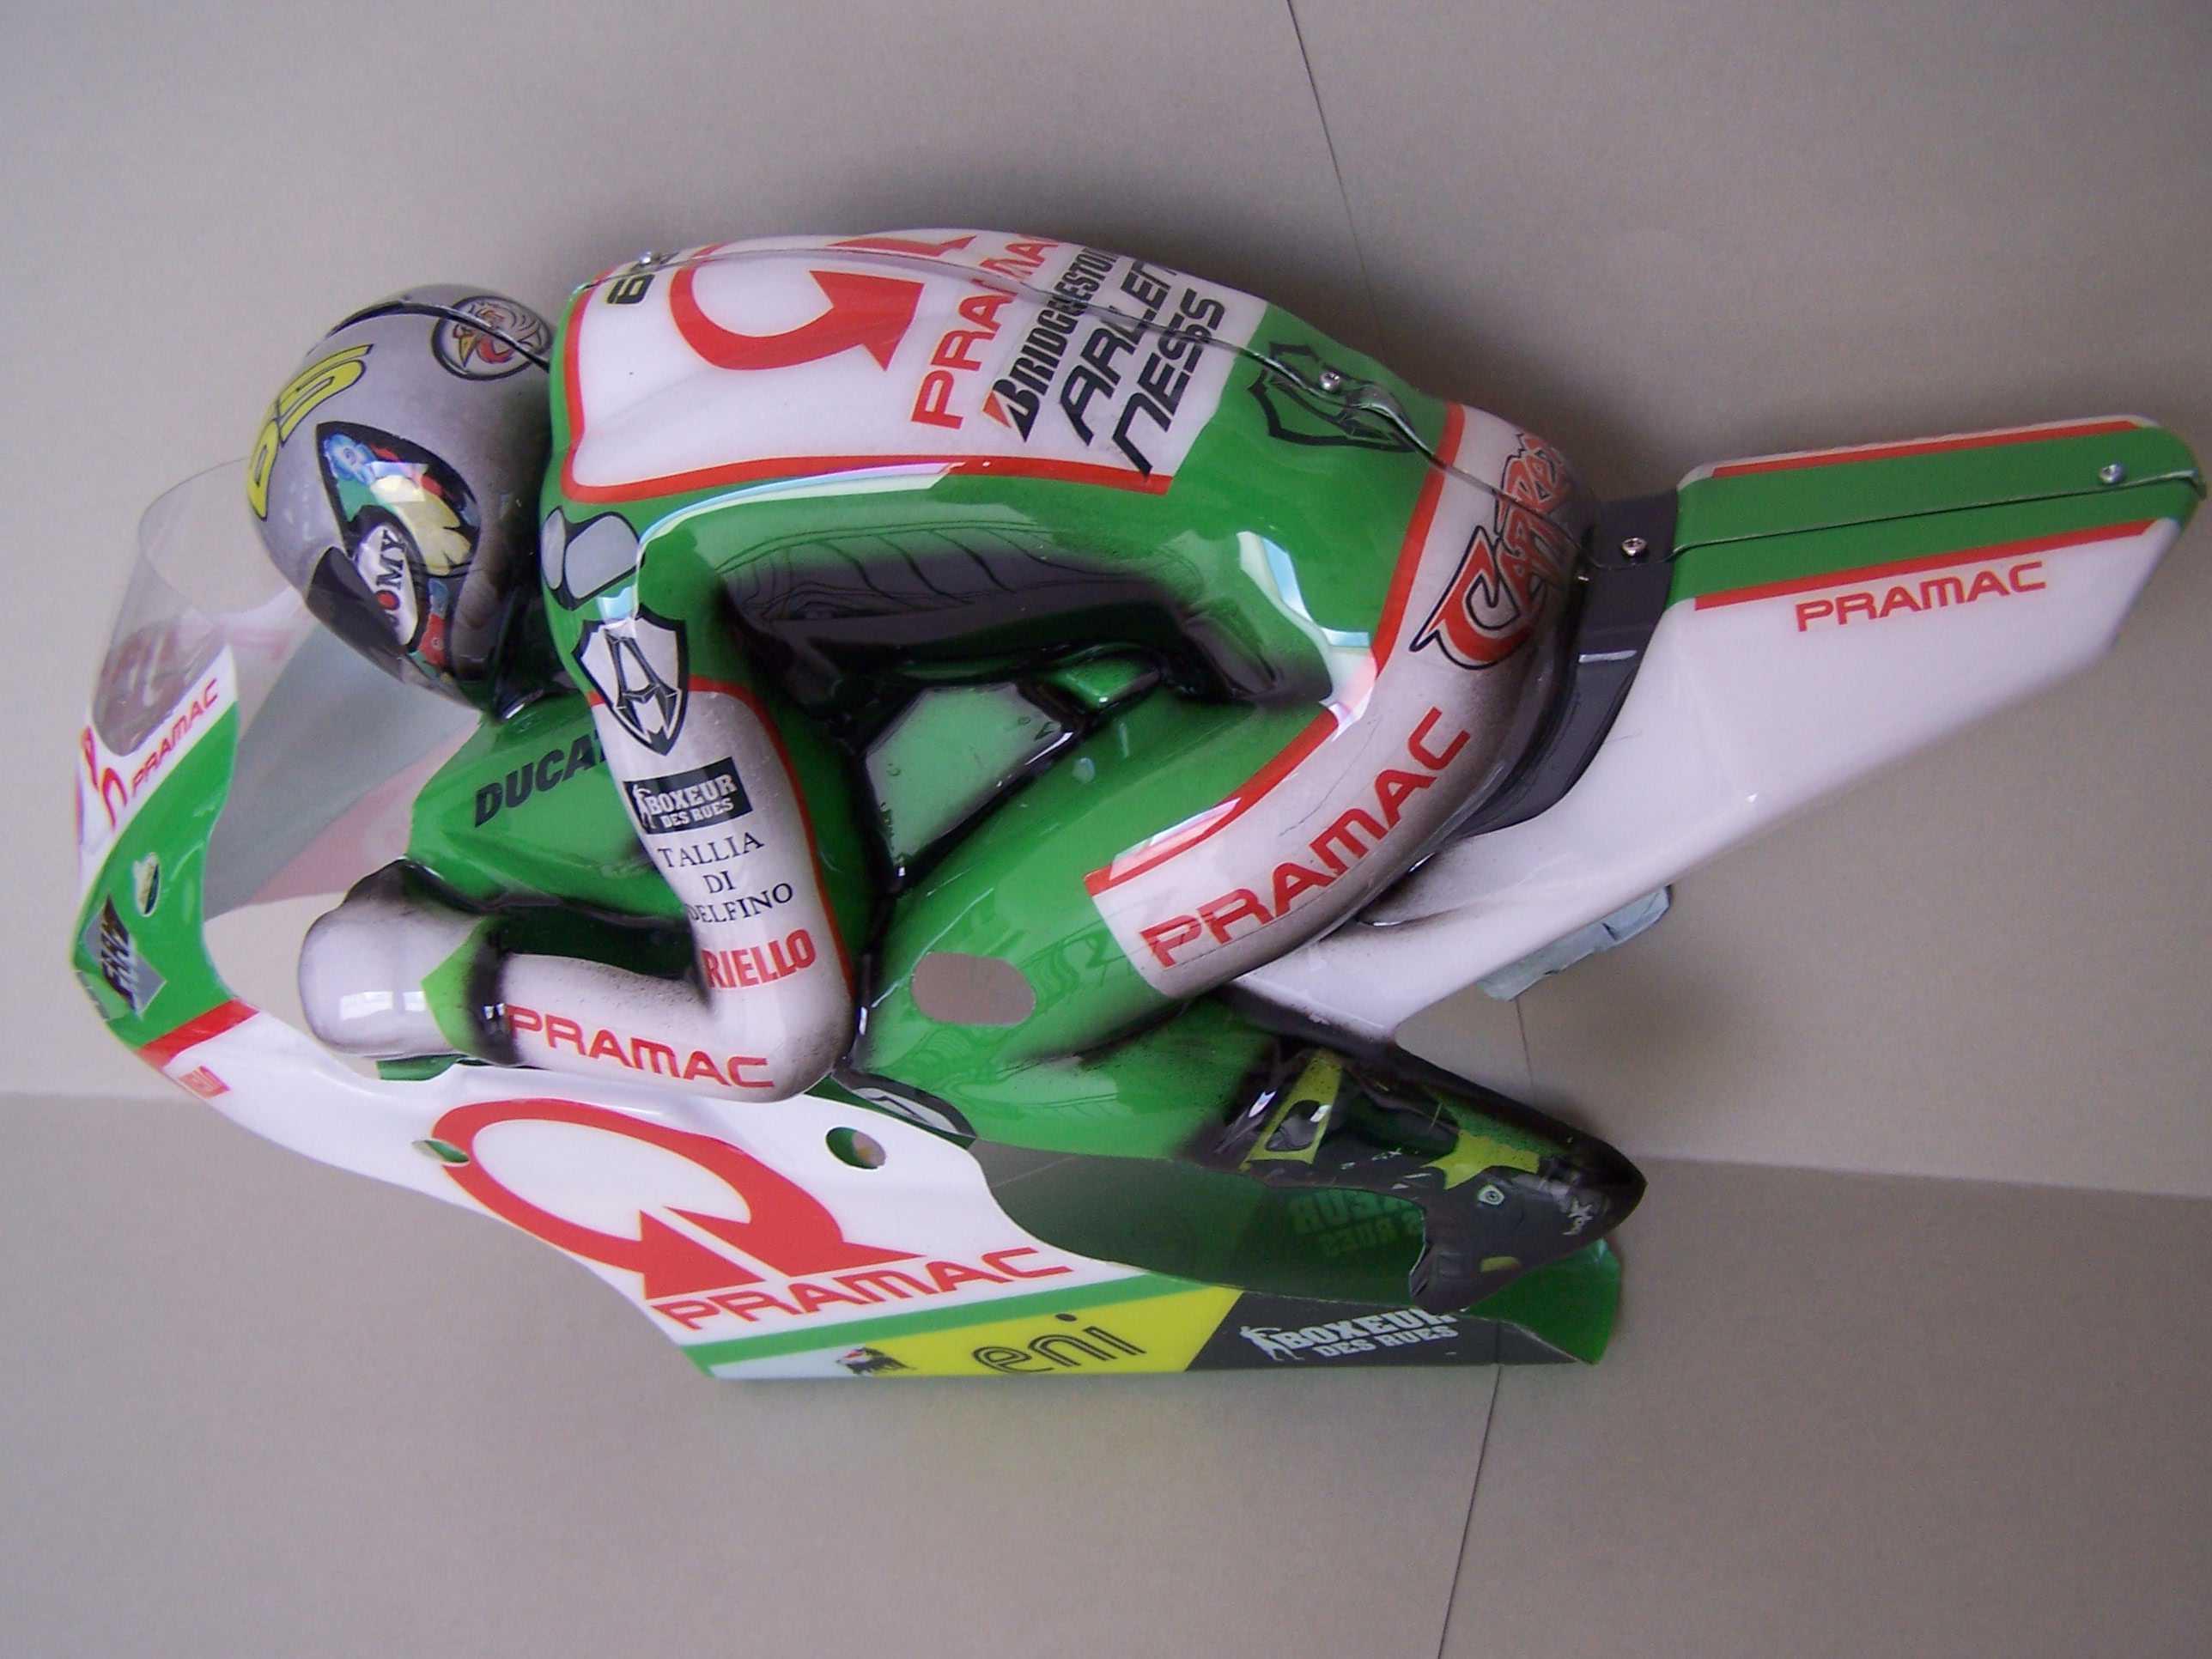 [Pramac-Ducati-Capirossi.jpgru_.jpg1_.jpg]